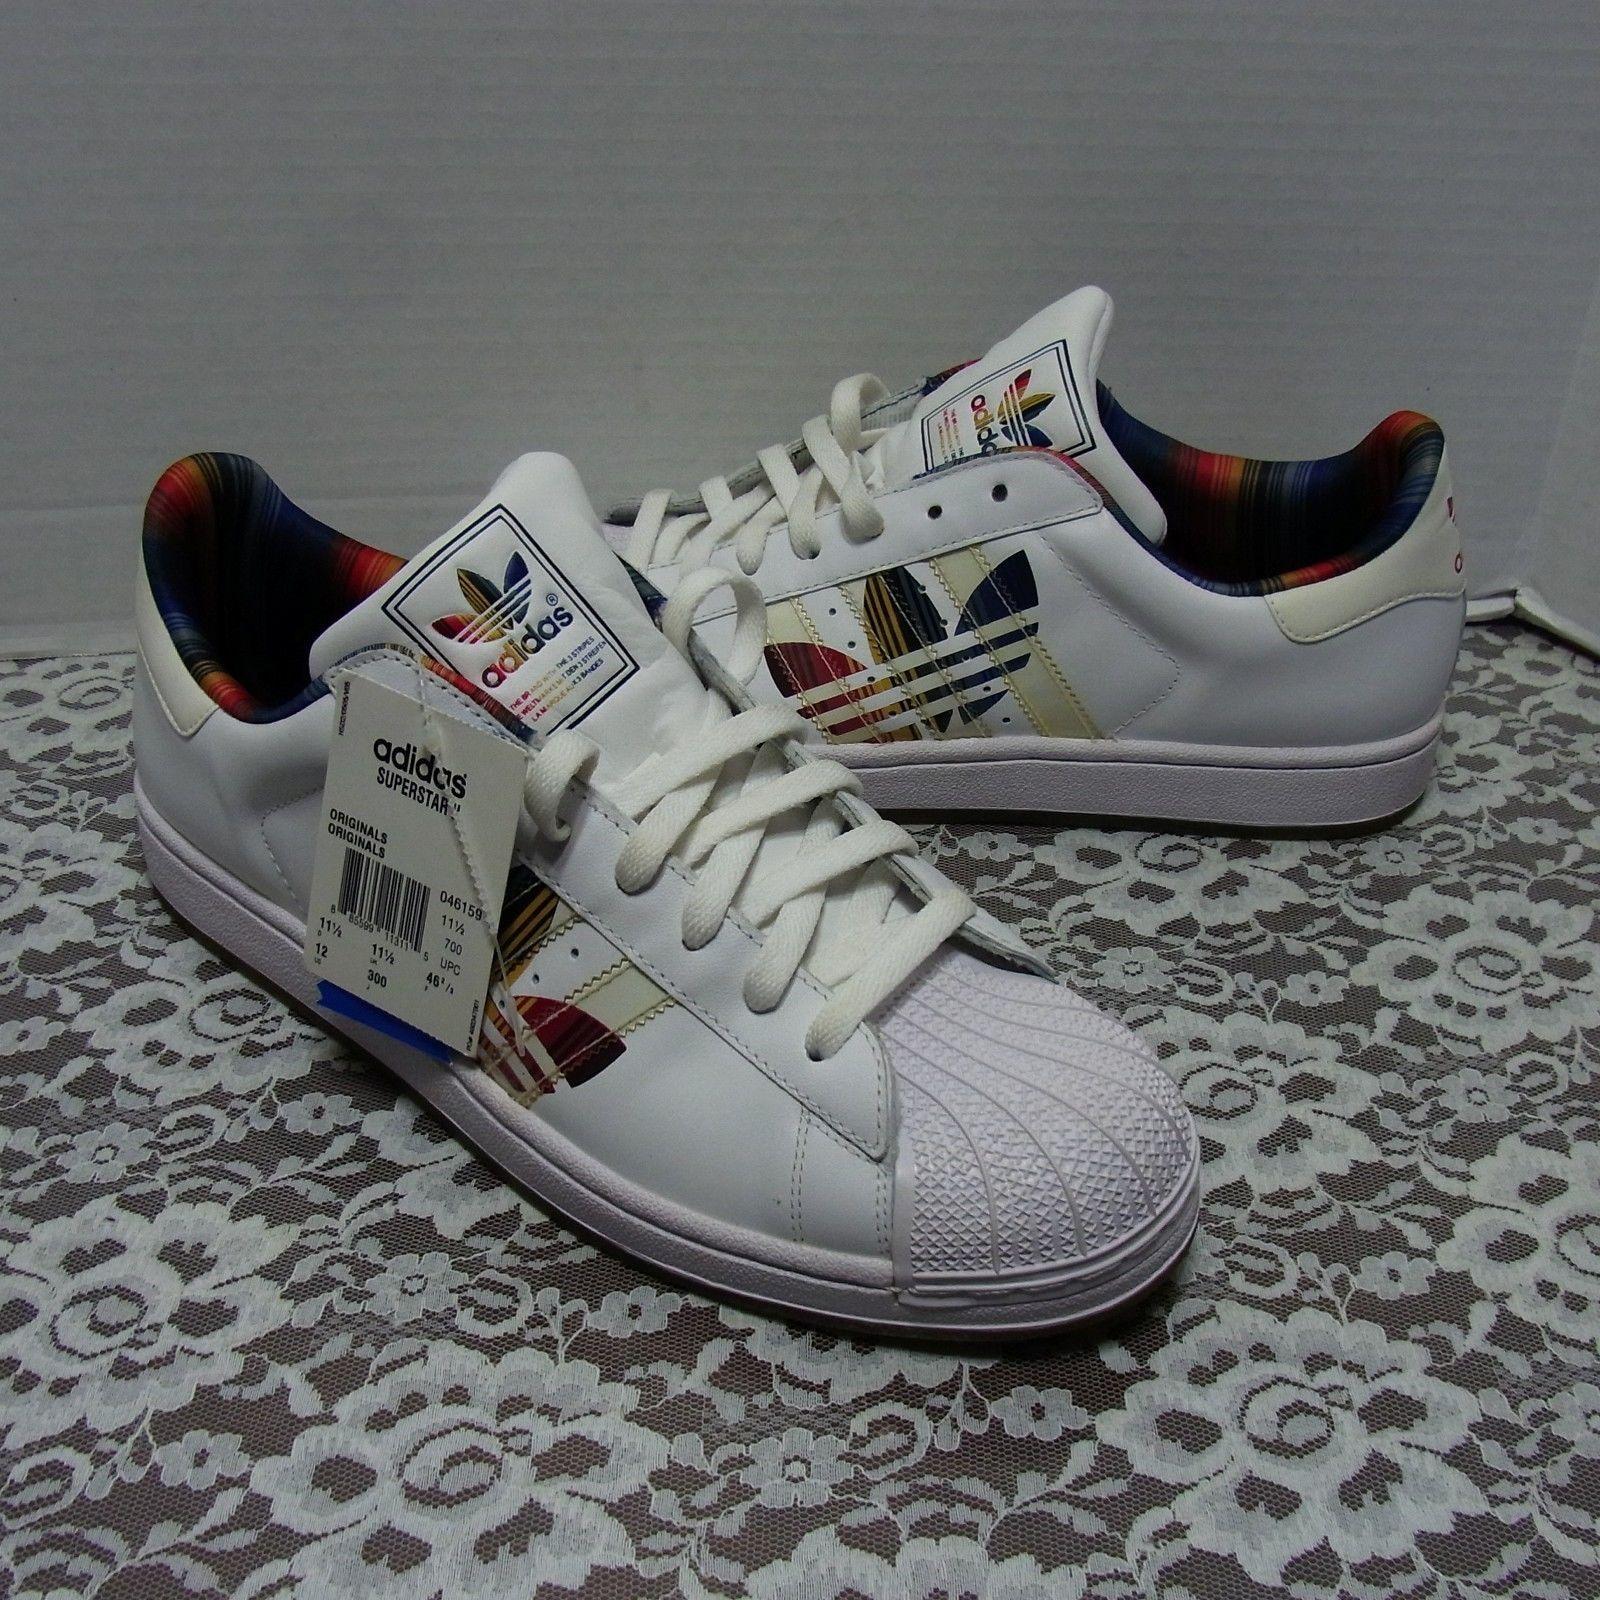 nuove adidas superstar ii 2 originali multi - colore scarpe mens scarpa